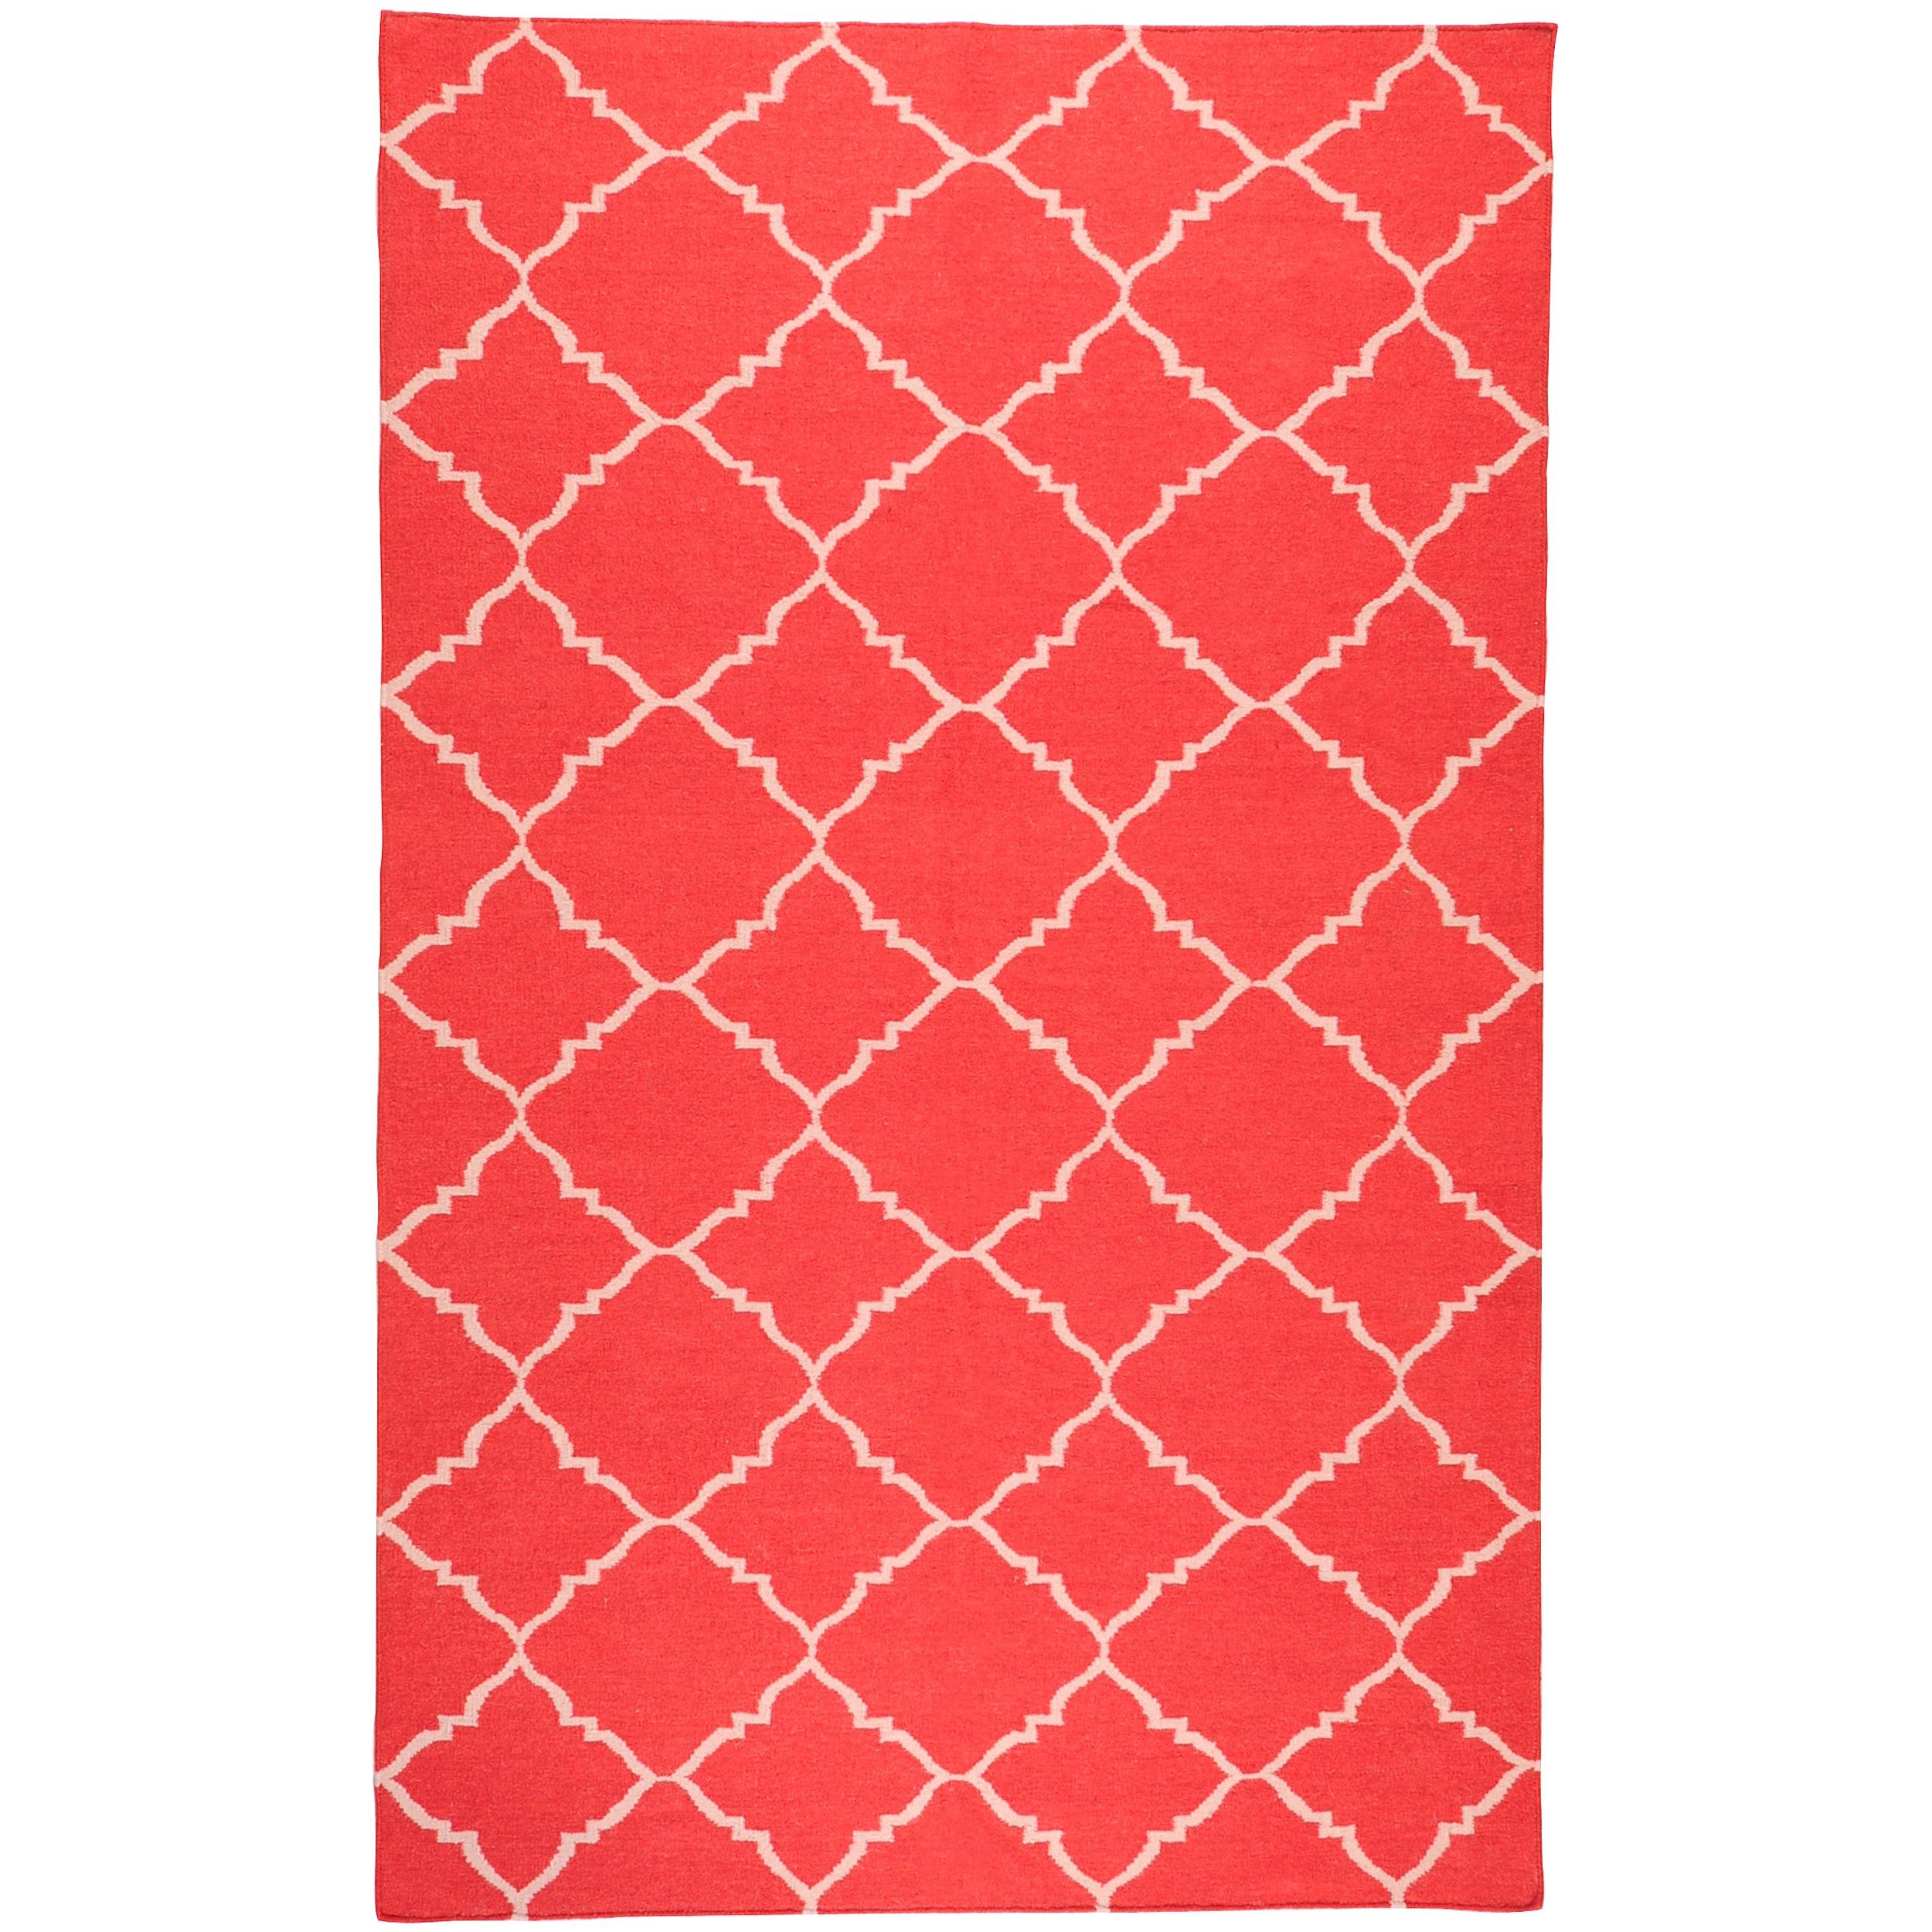 Hand-woven Red Wool Biro Rug (3'6 x 5'6)